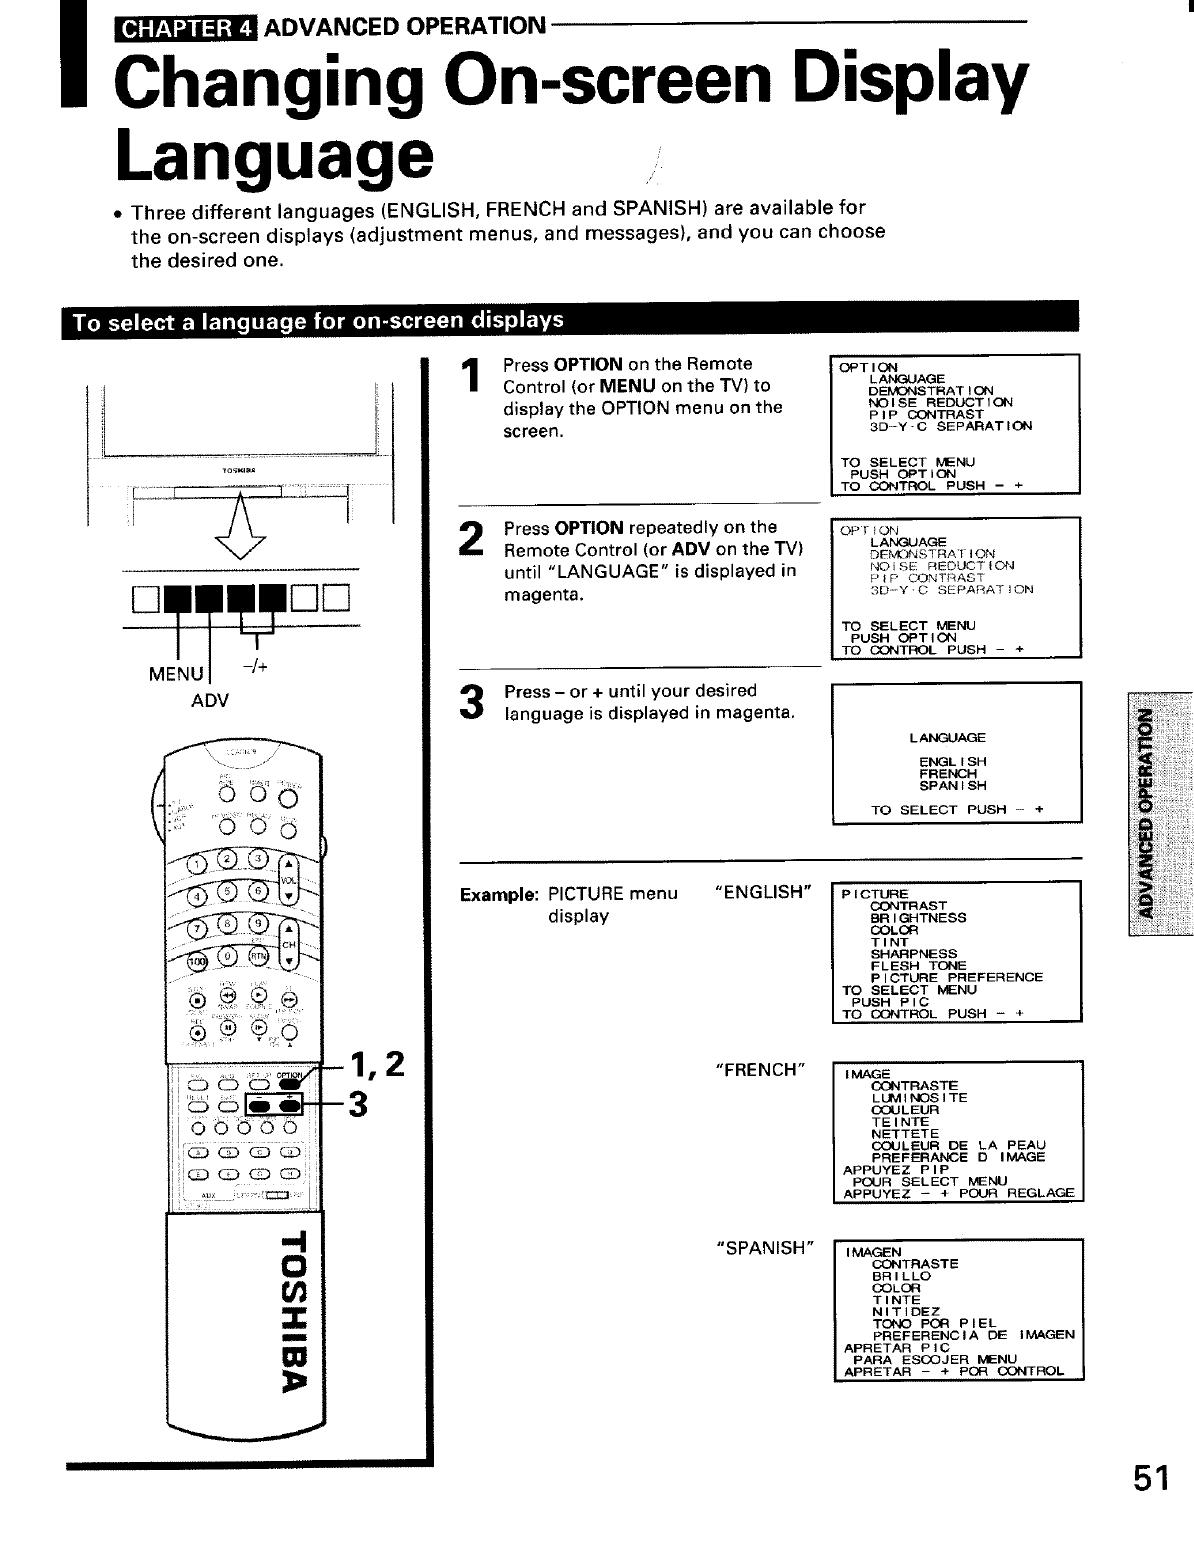 Toshiba Tw56D90 Users Manual